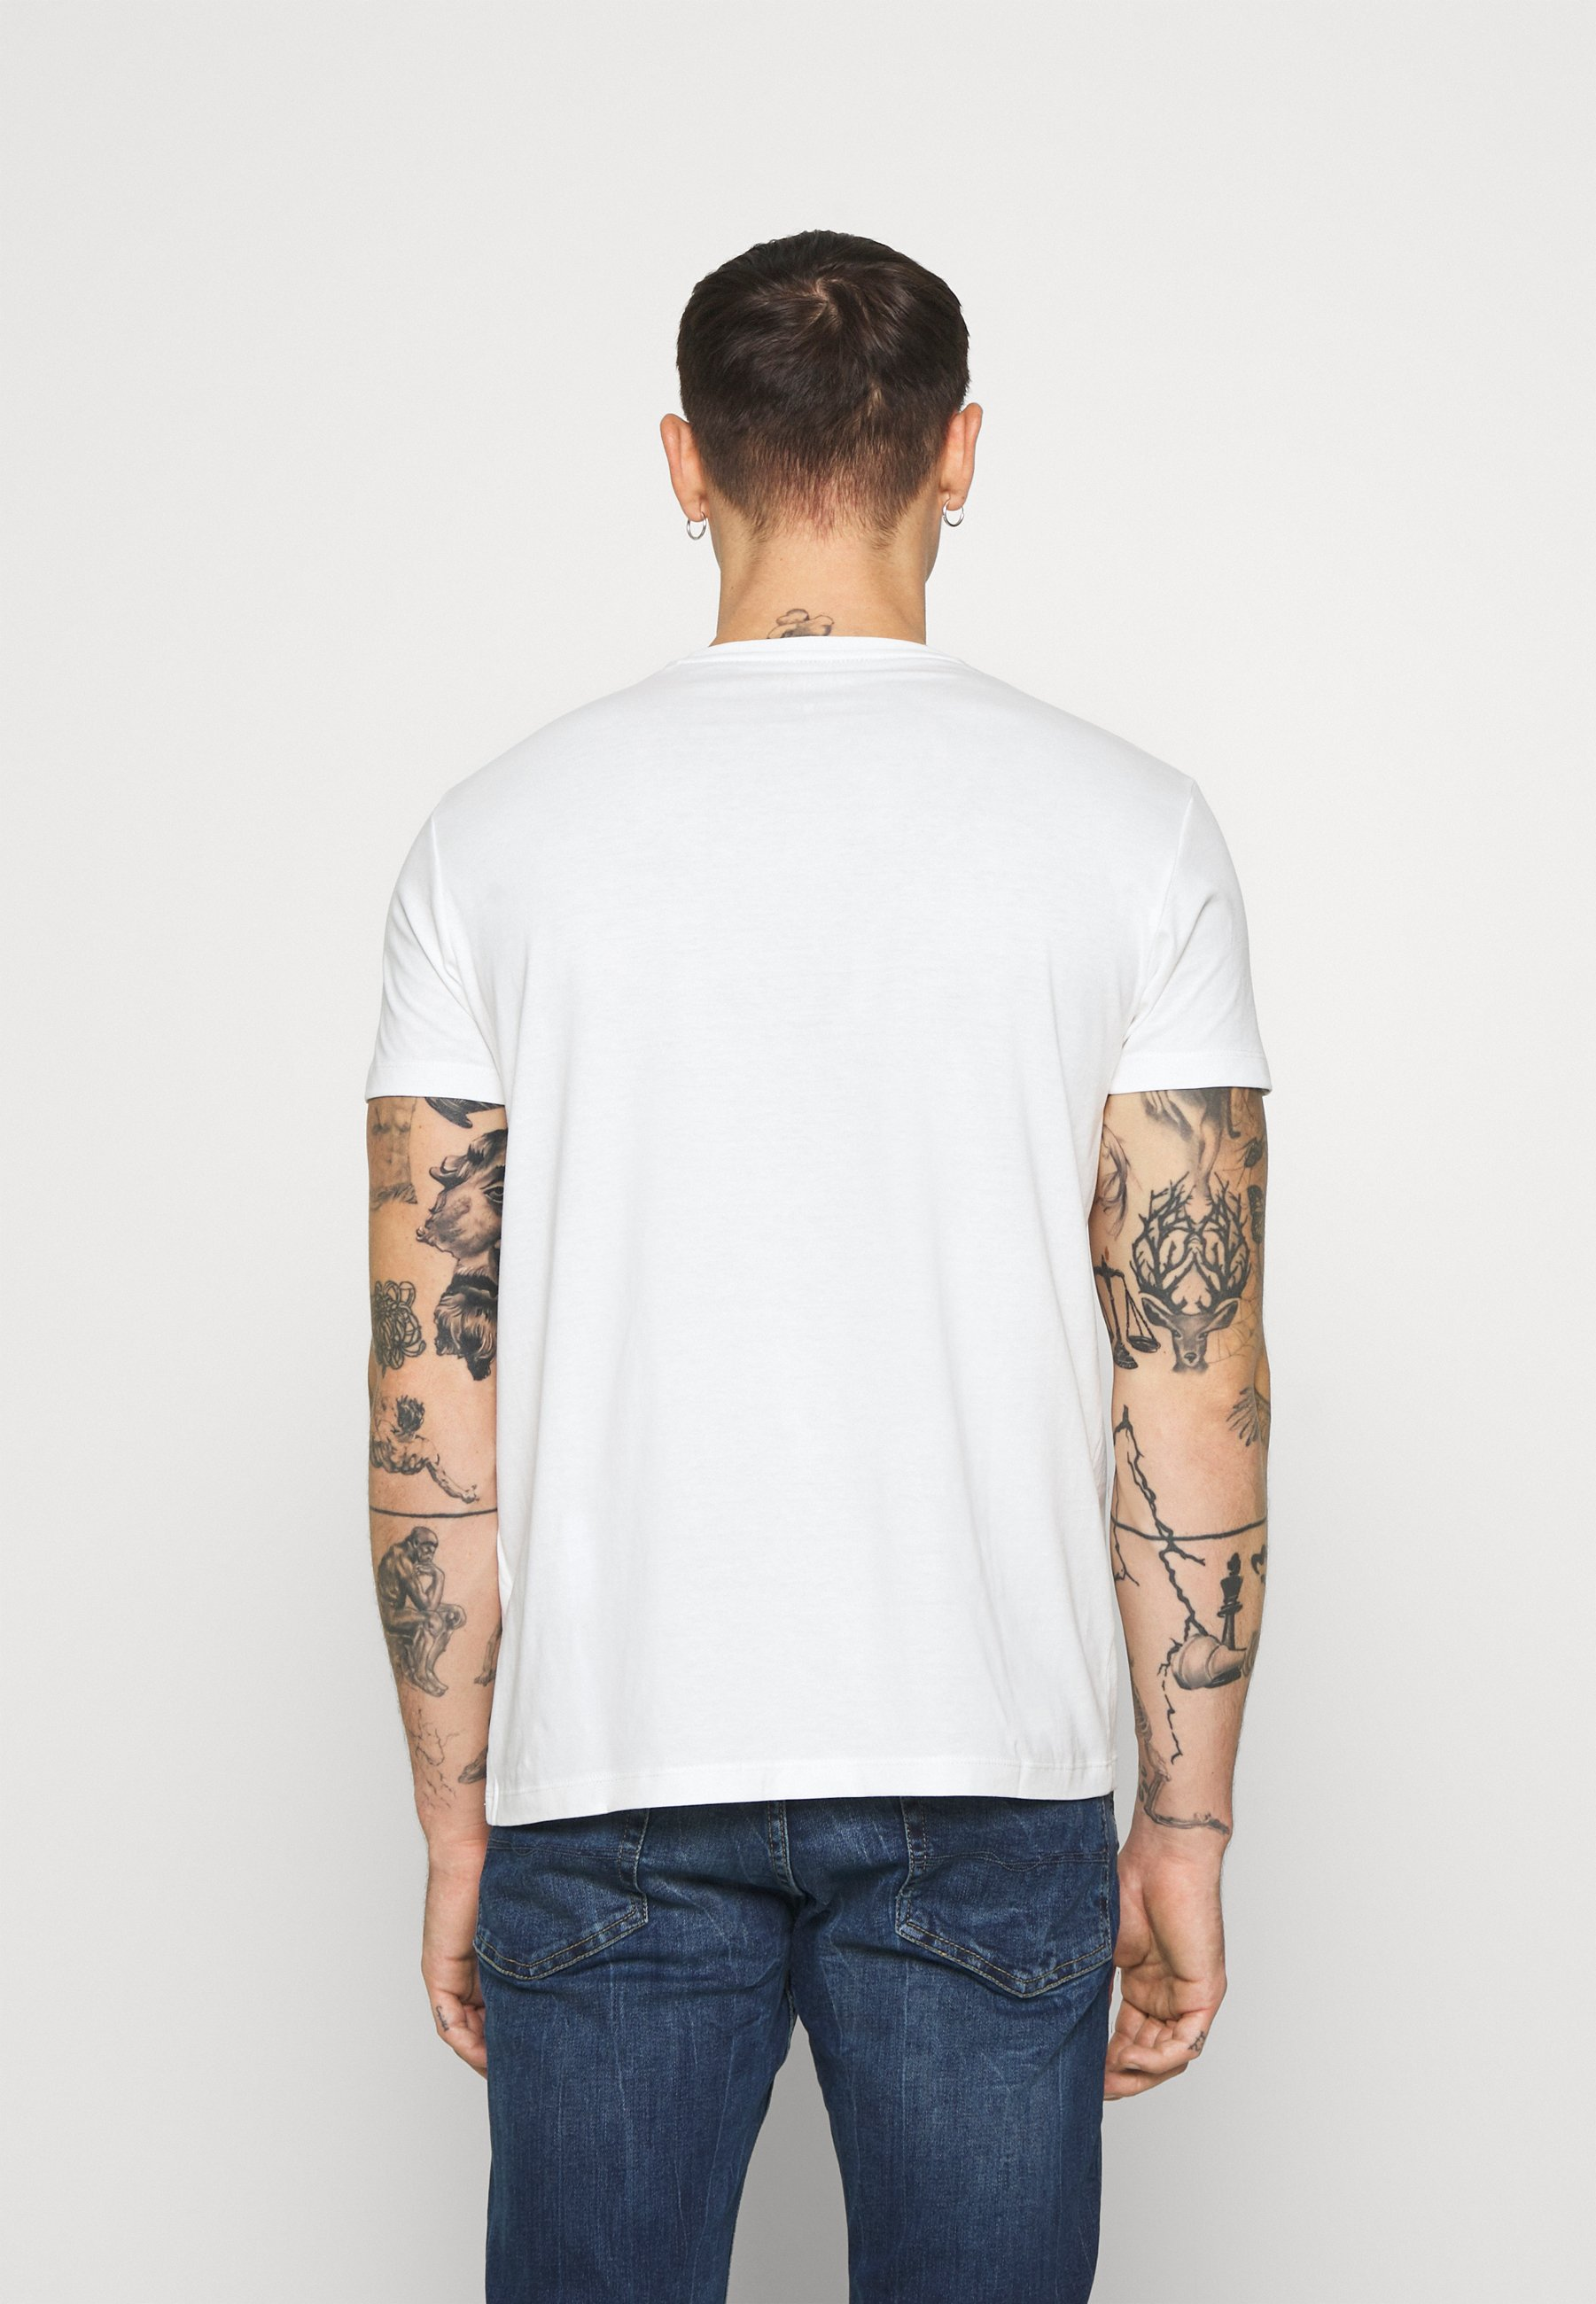 Esprit Print T-shirt - off-white 6yrzm